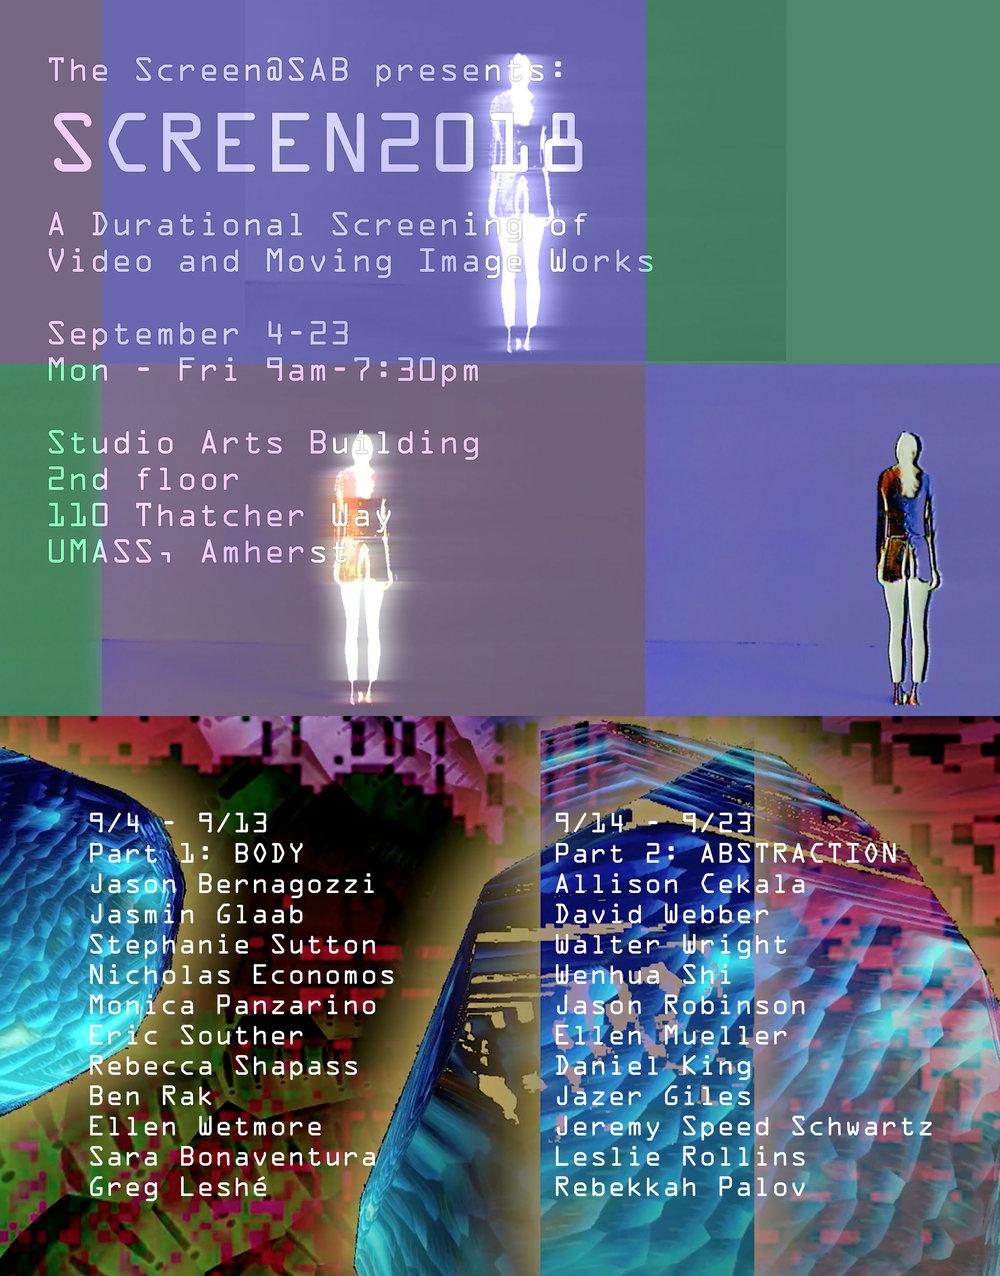 SCREEN2018 Poster.jpg